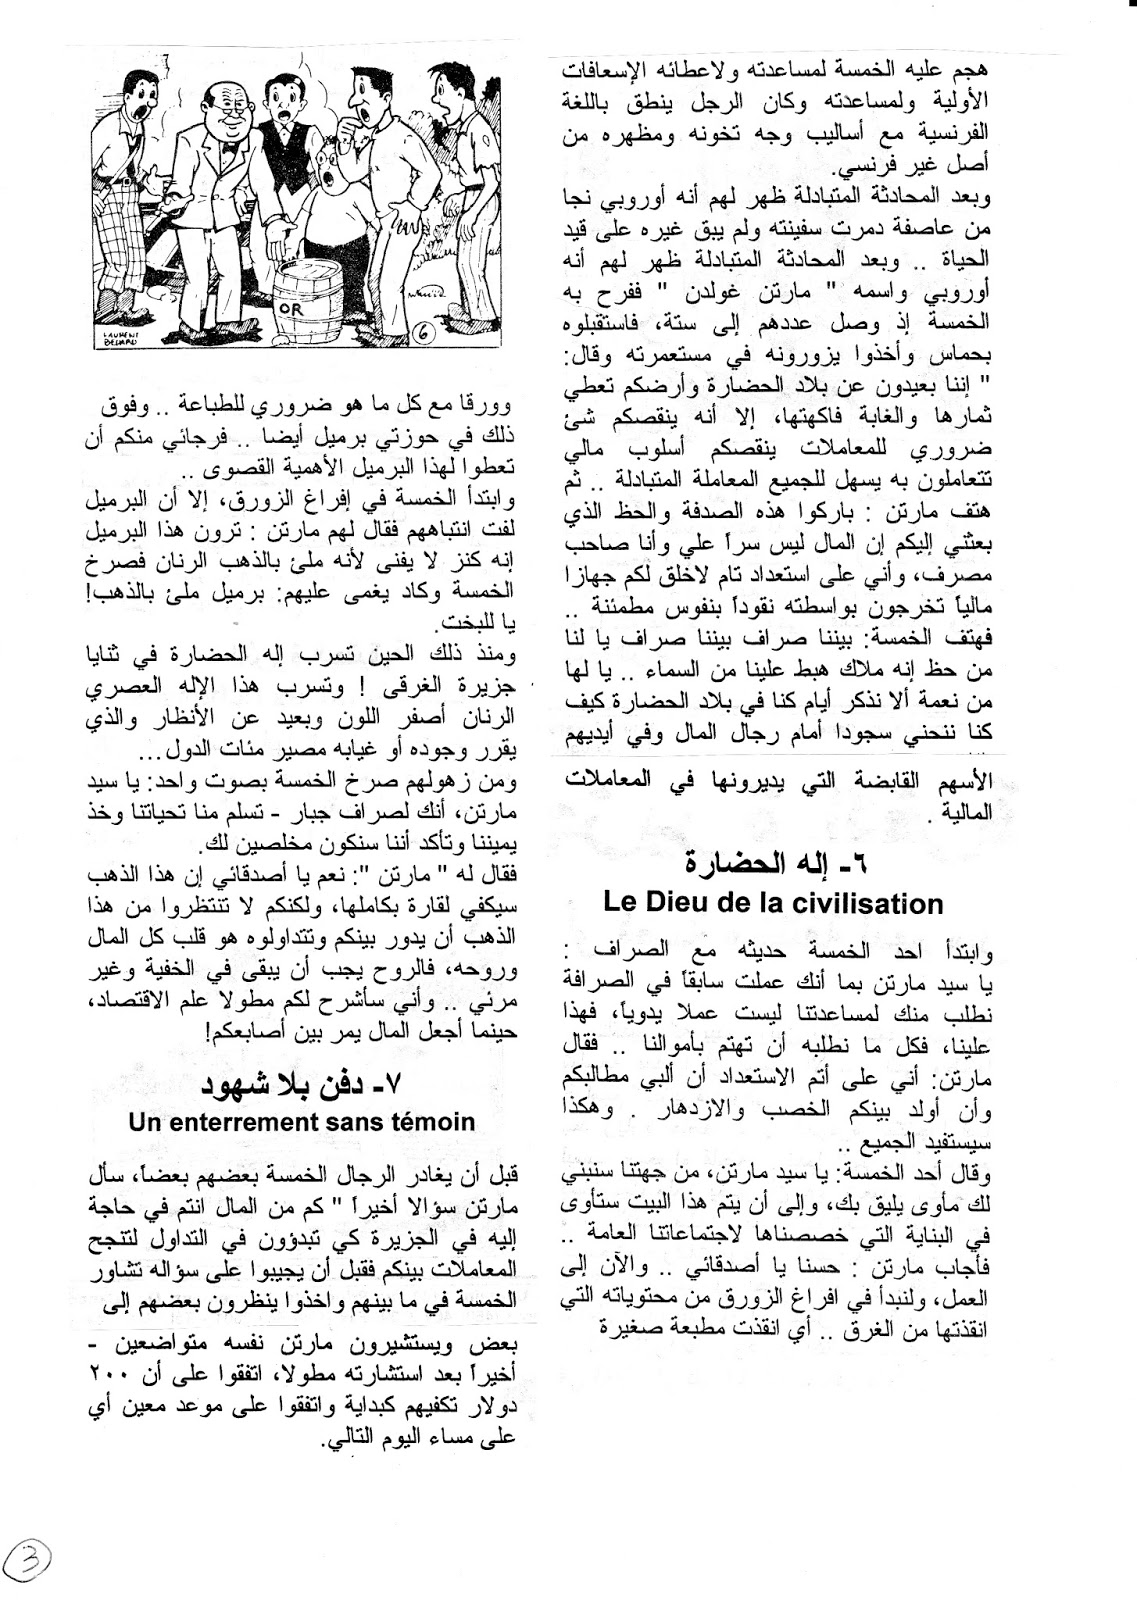 françois de siebenthal disparitions of documents in qatar the